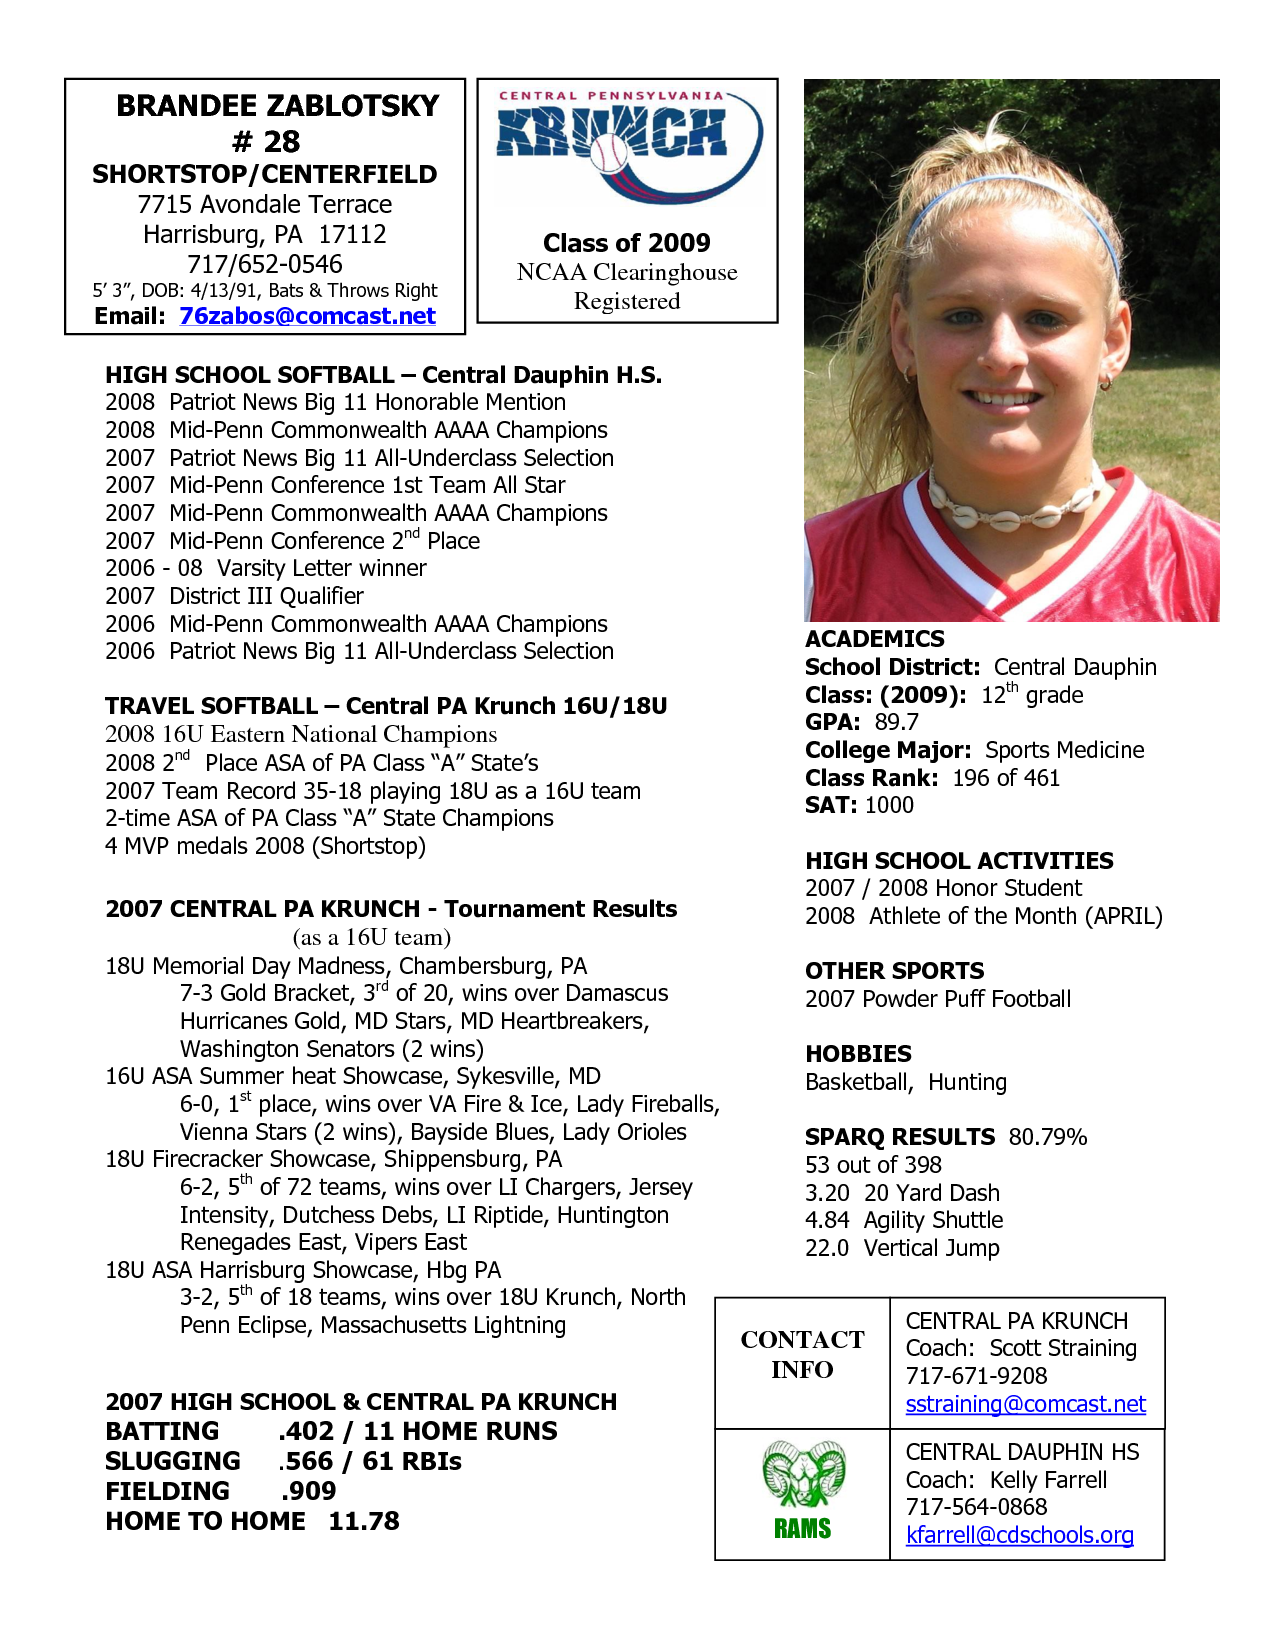 softball team profile templates player profile central softball team profile templates player profile central pennsylvania krunch softball